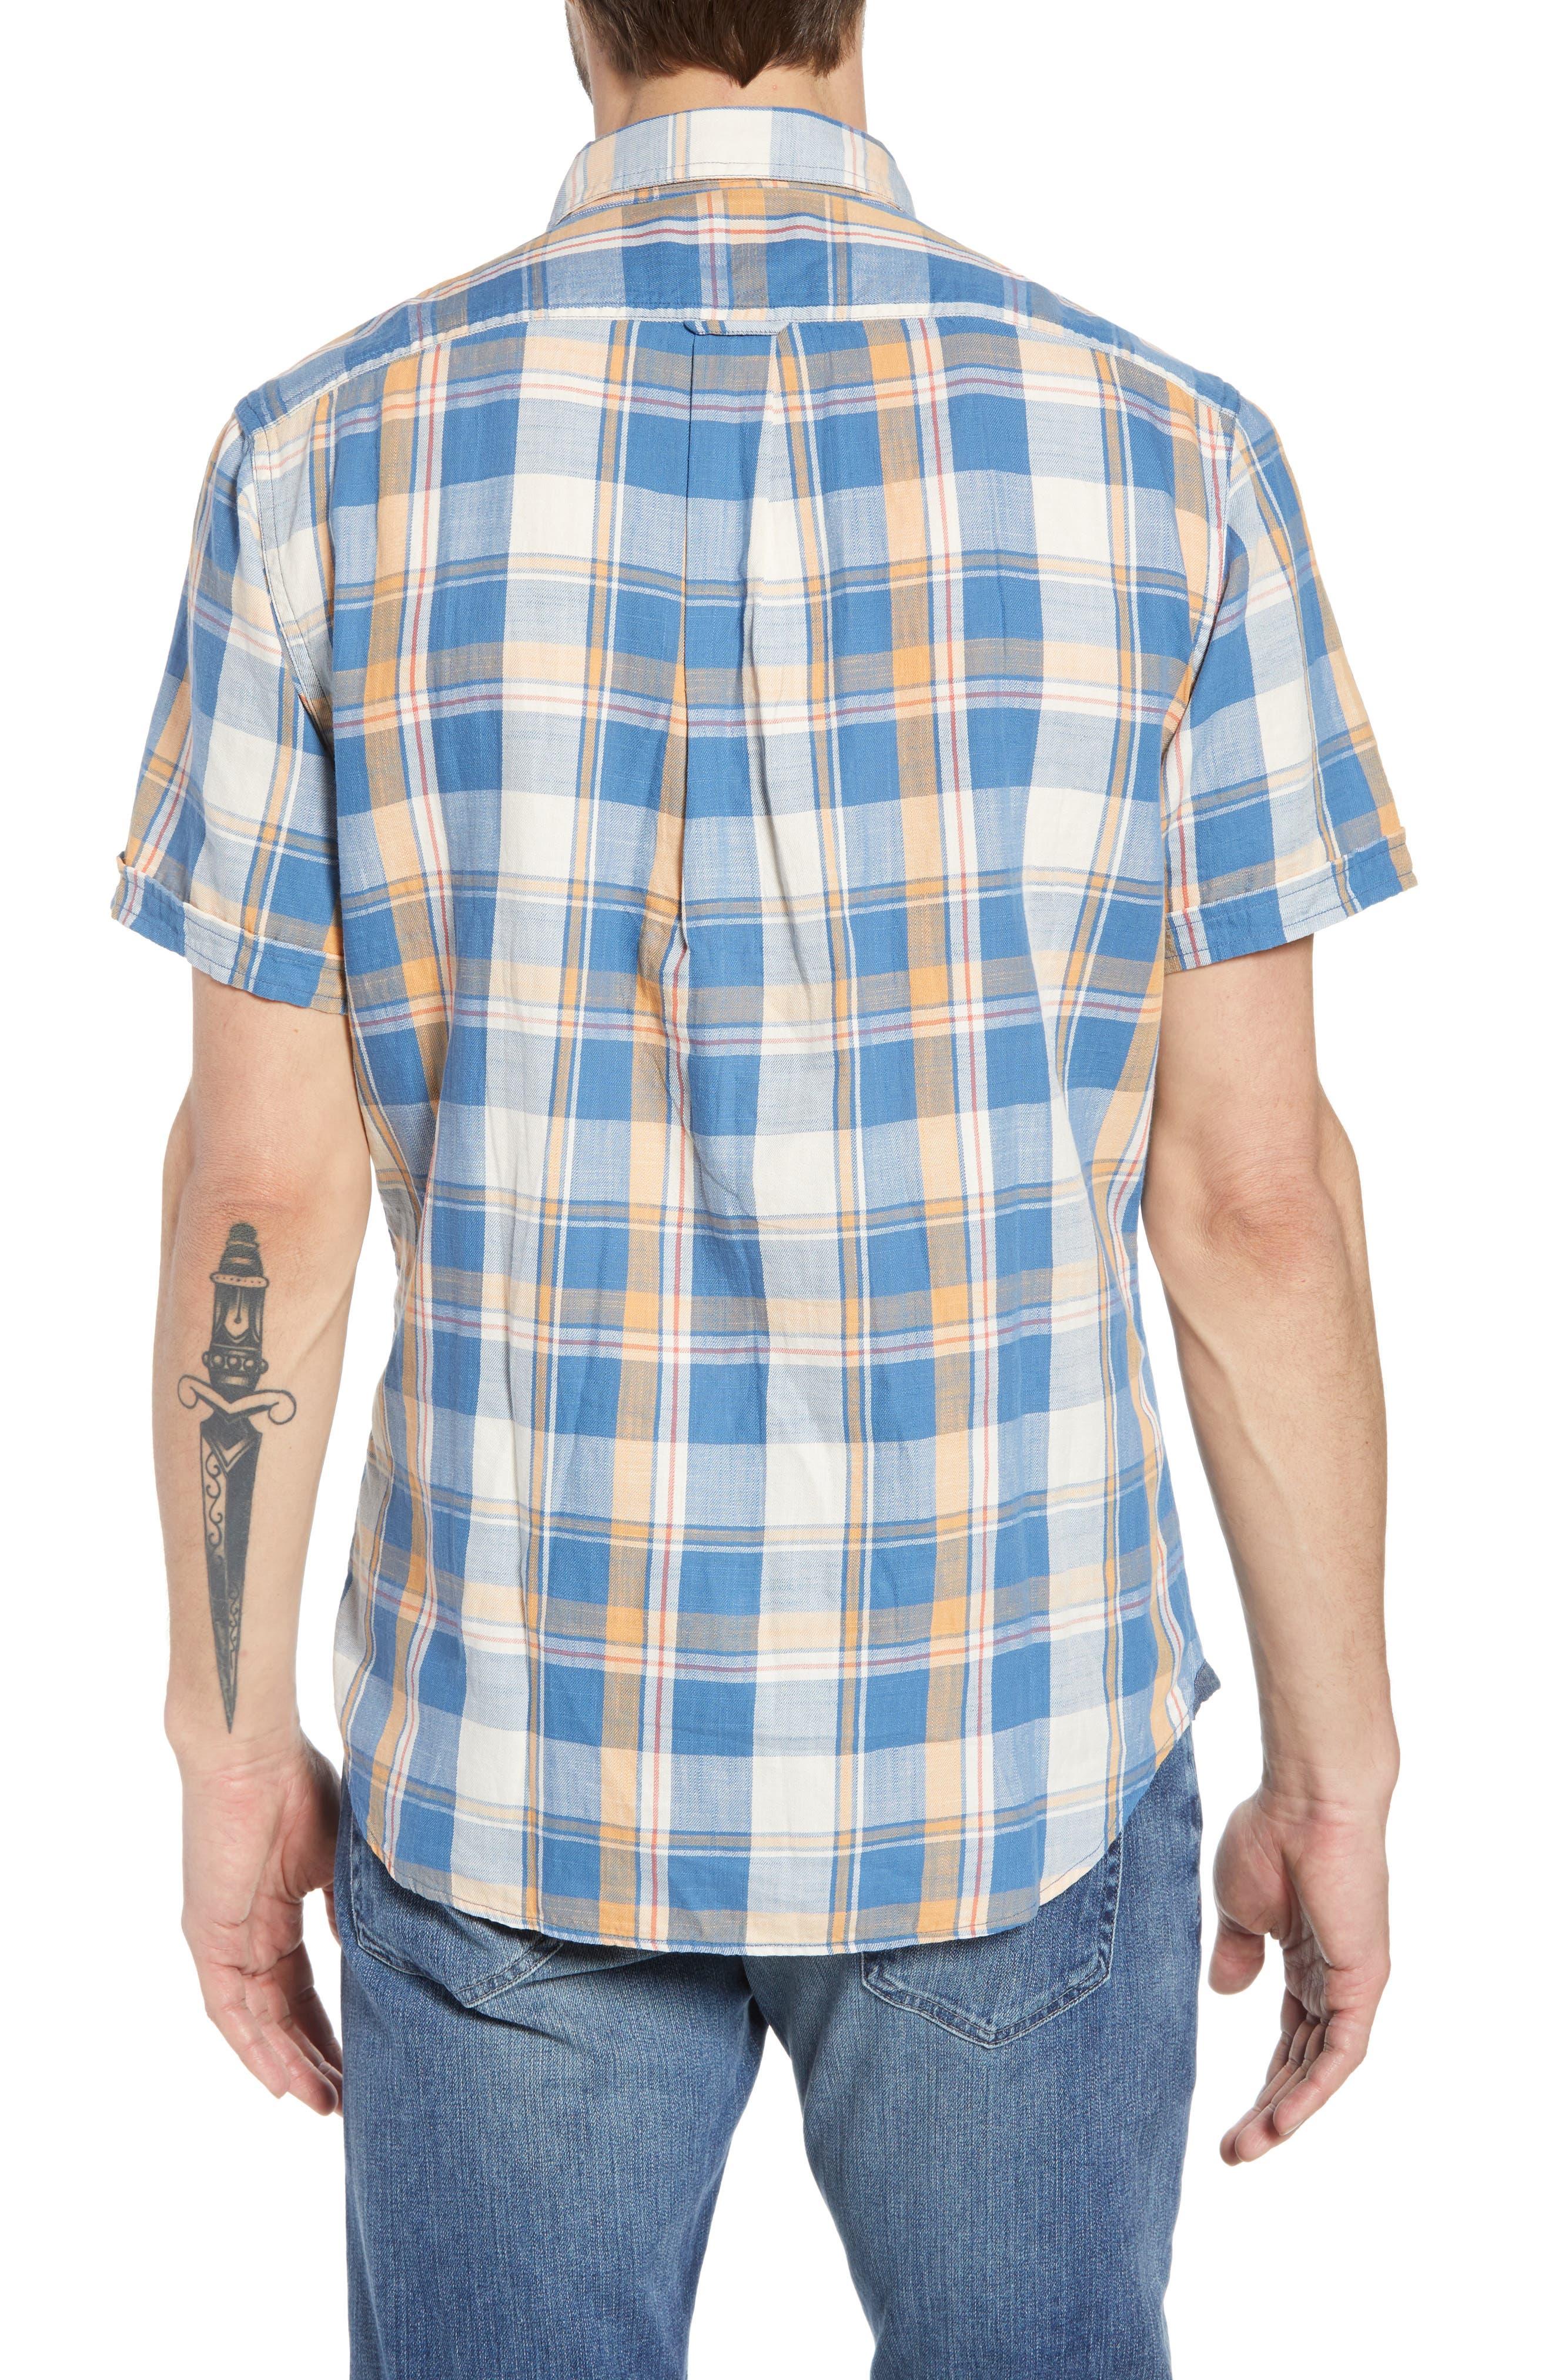 Sherman Plaid Slub Twill Sport Shirt,                             Alternate thumbnail 3, color,                             Blue Mustard Red